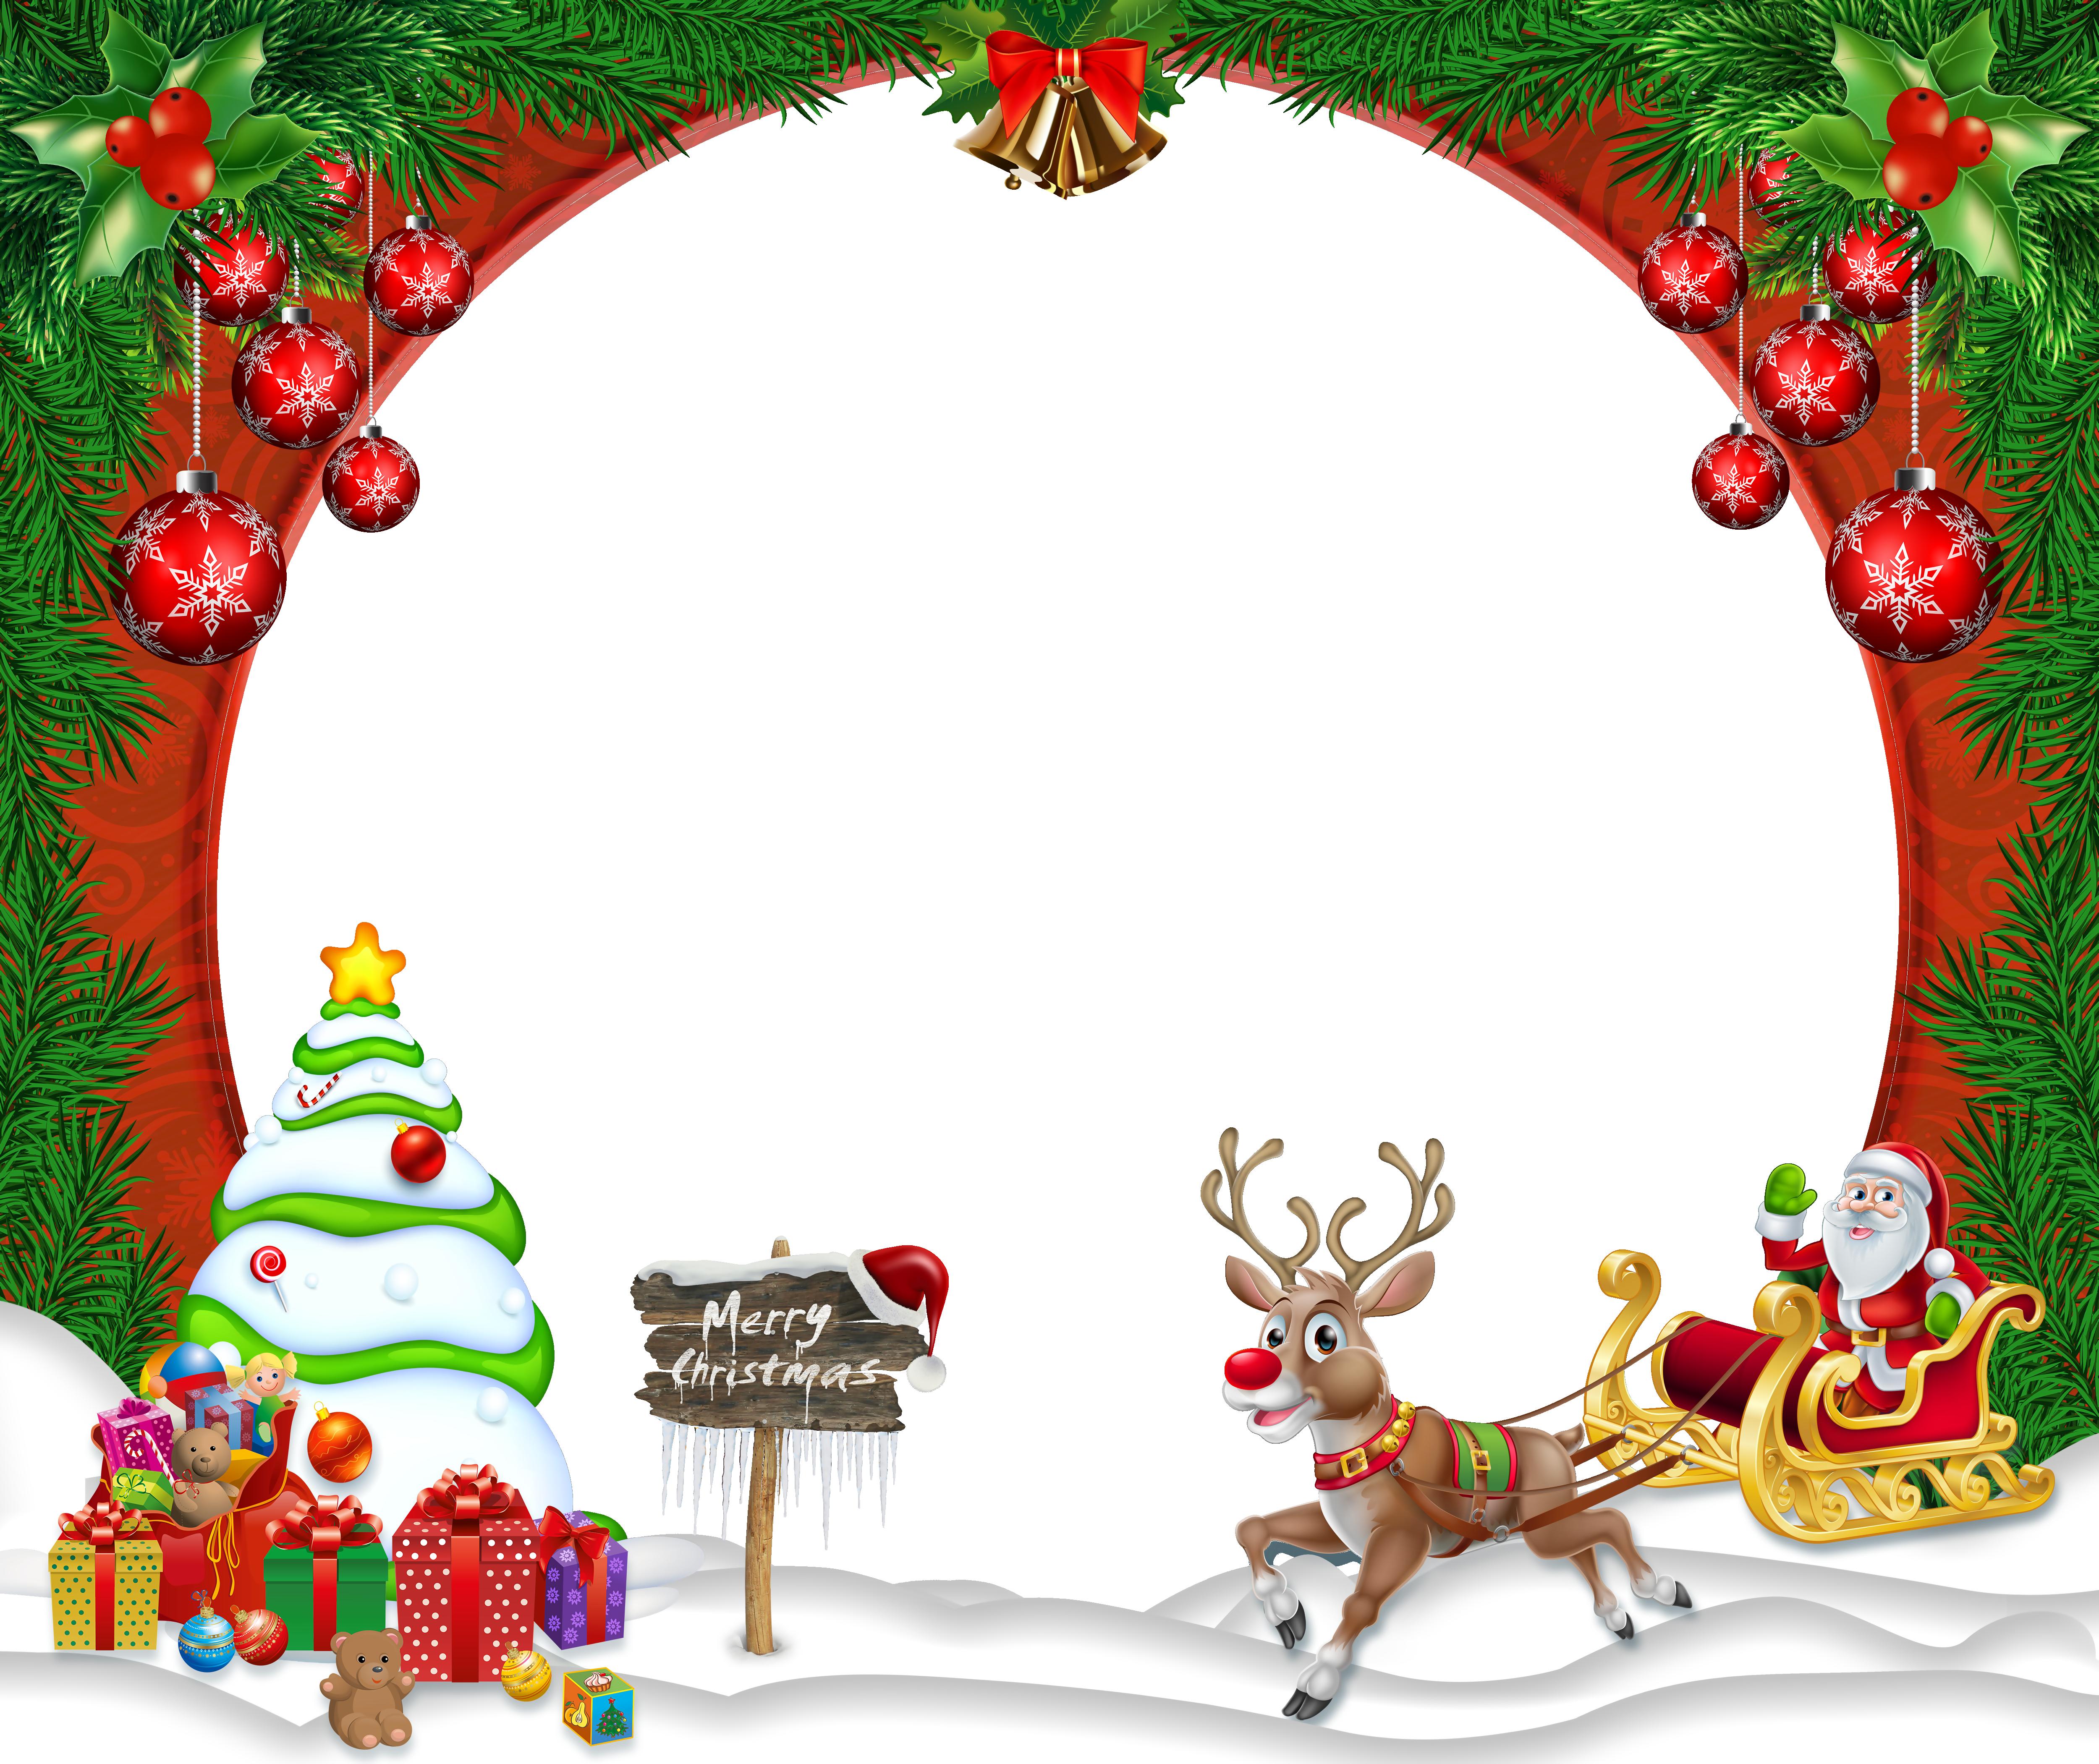 merry christmas border.